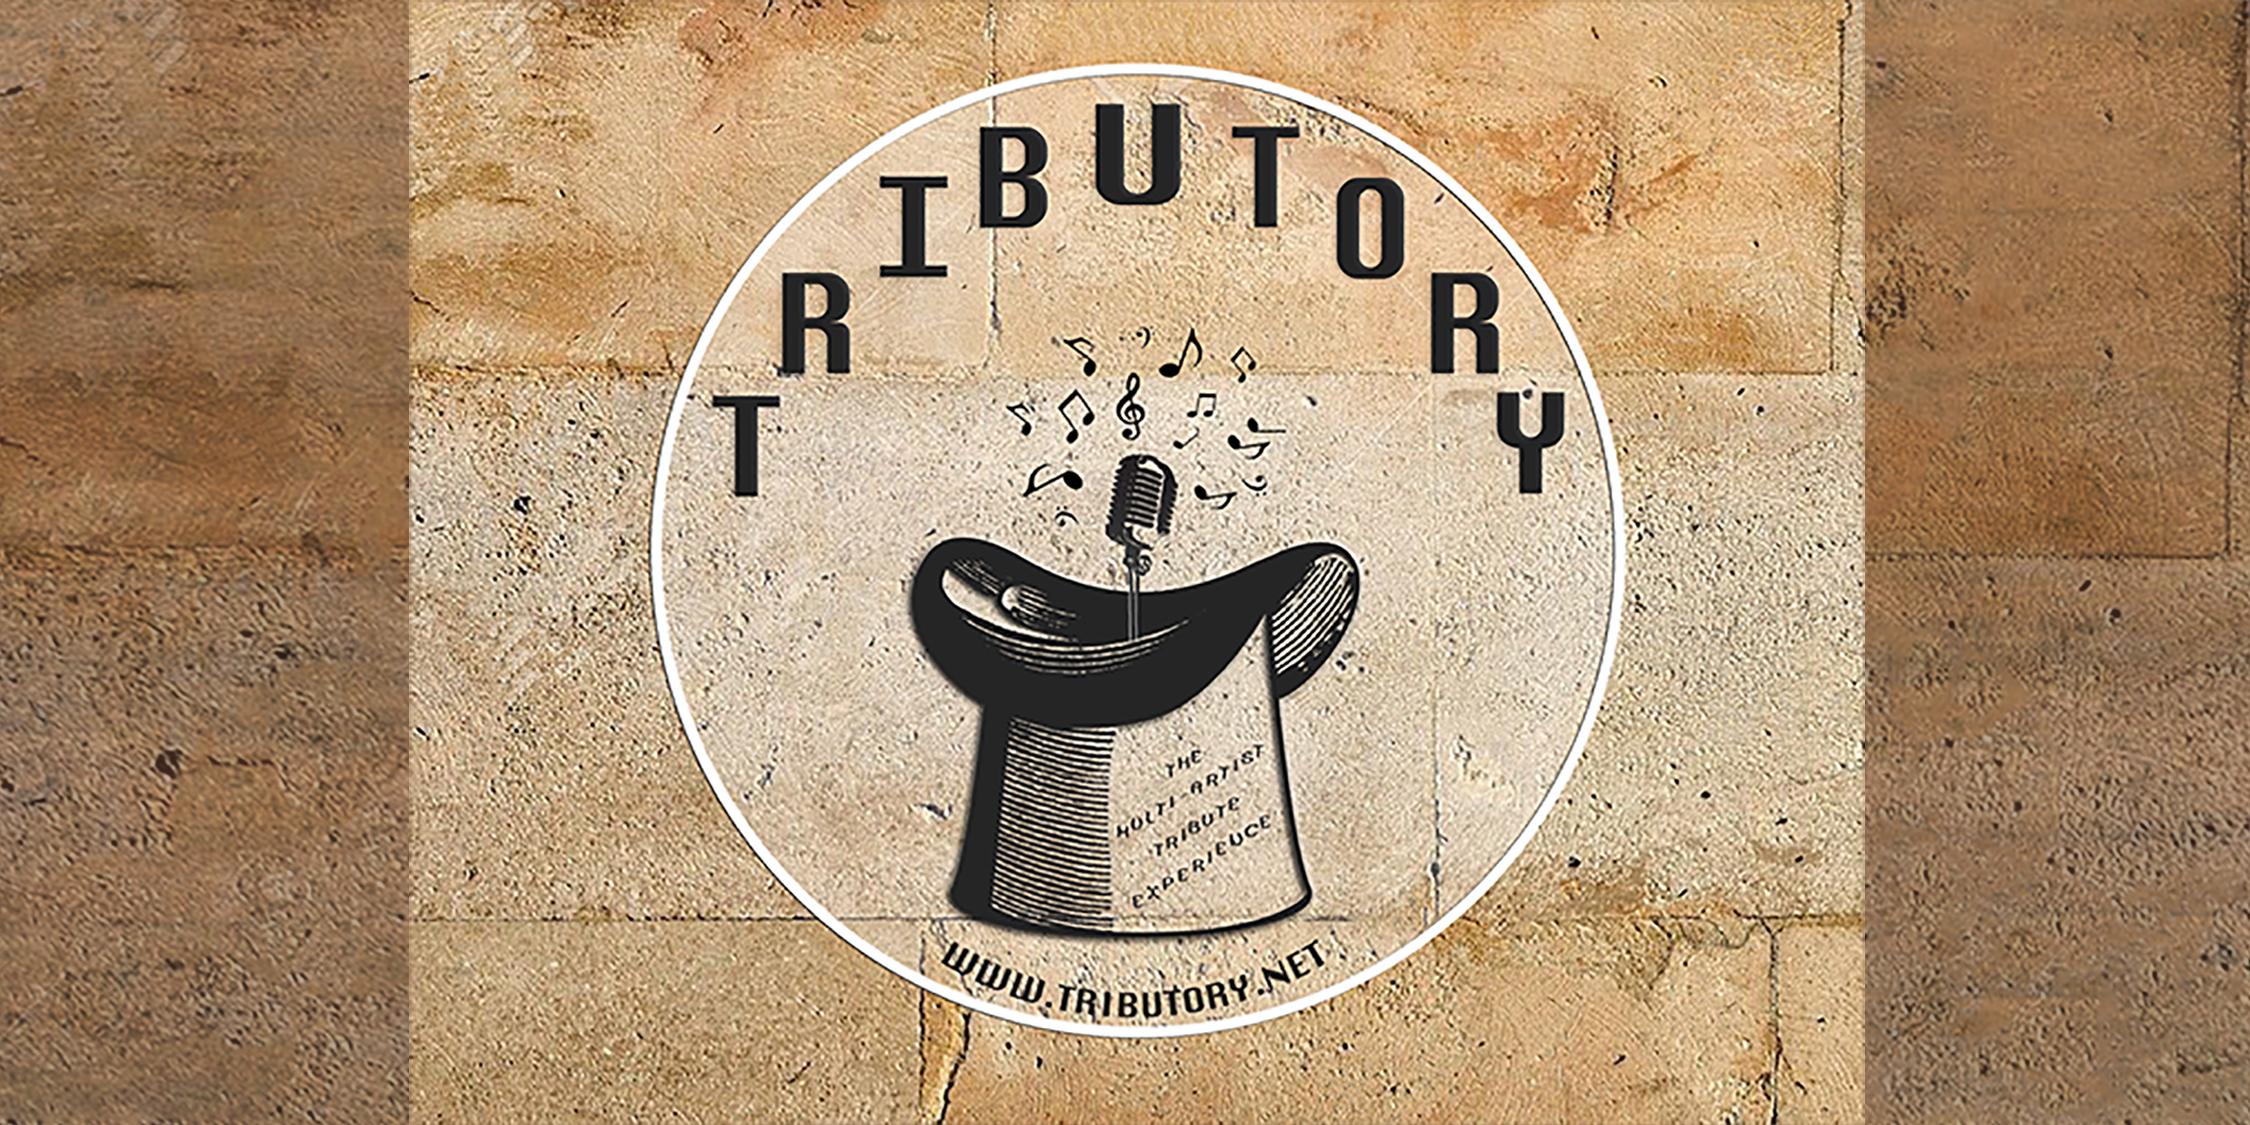 Tributory